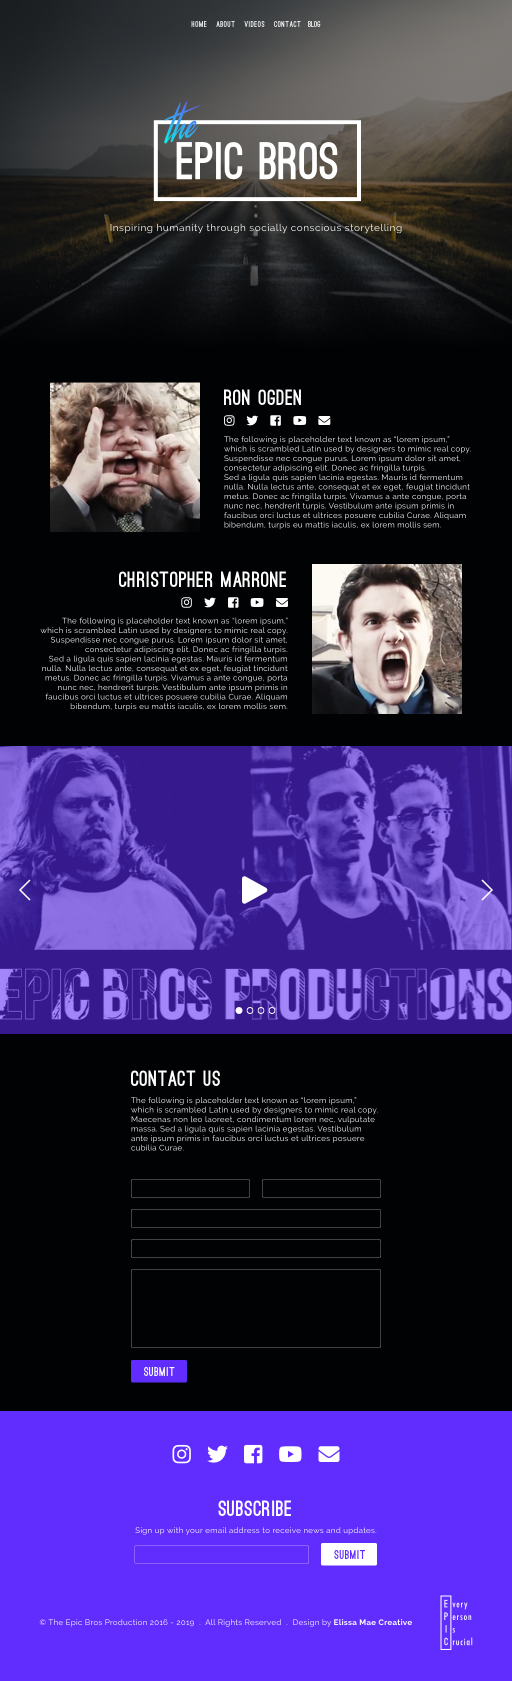 The Epic Bros Website